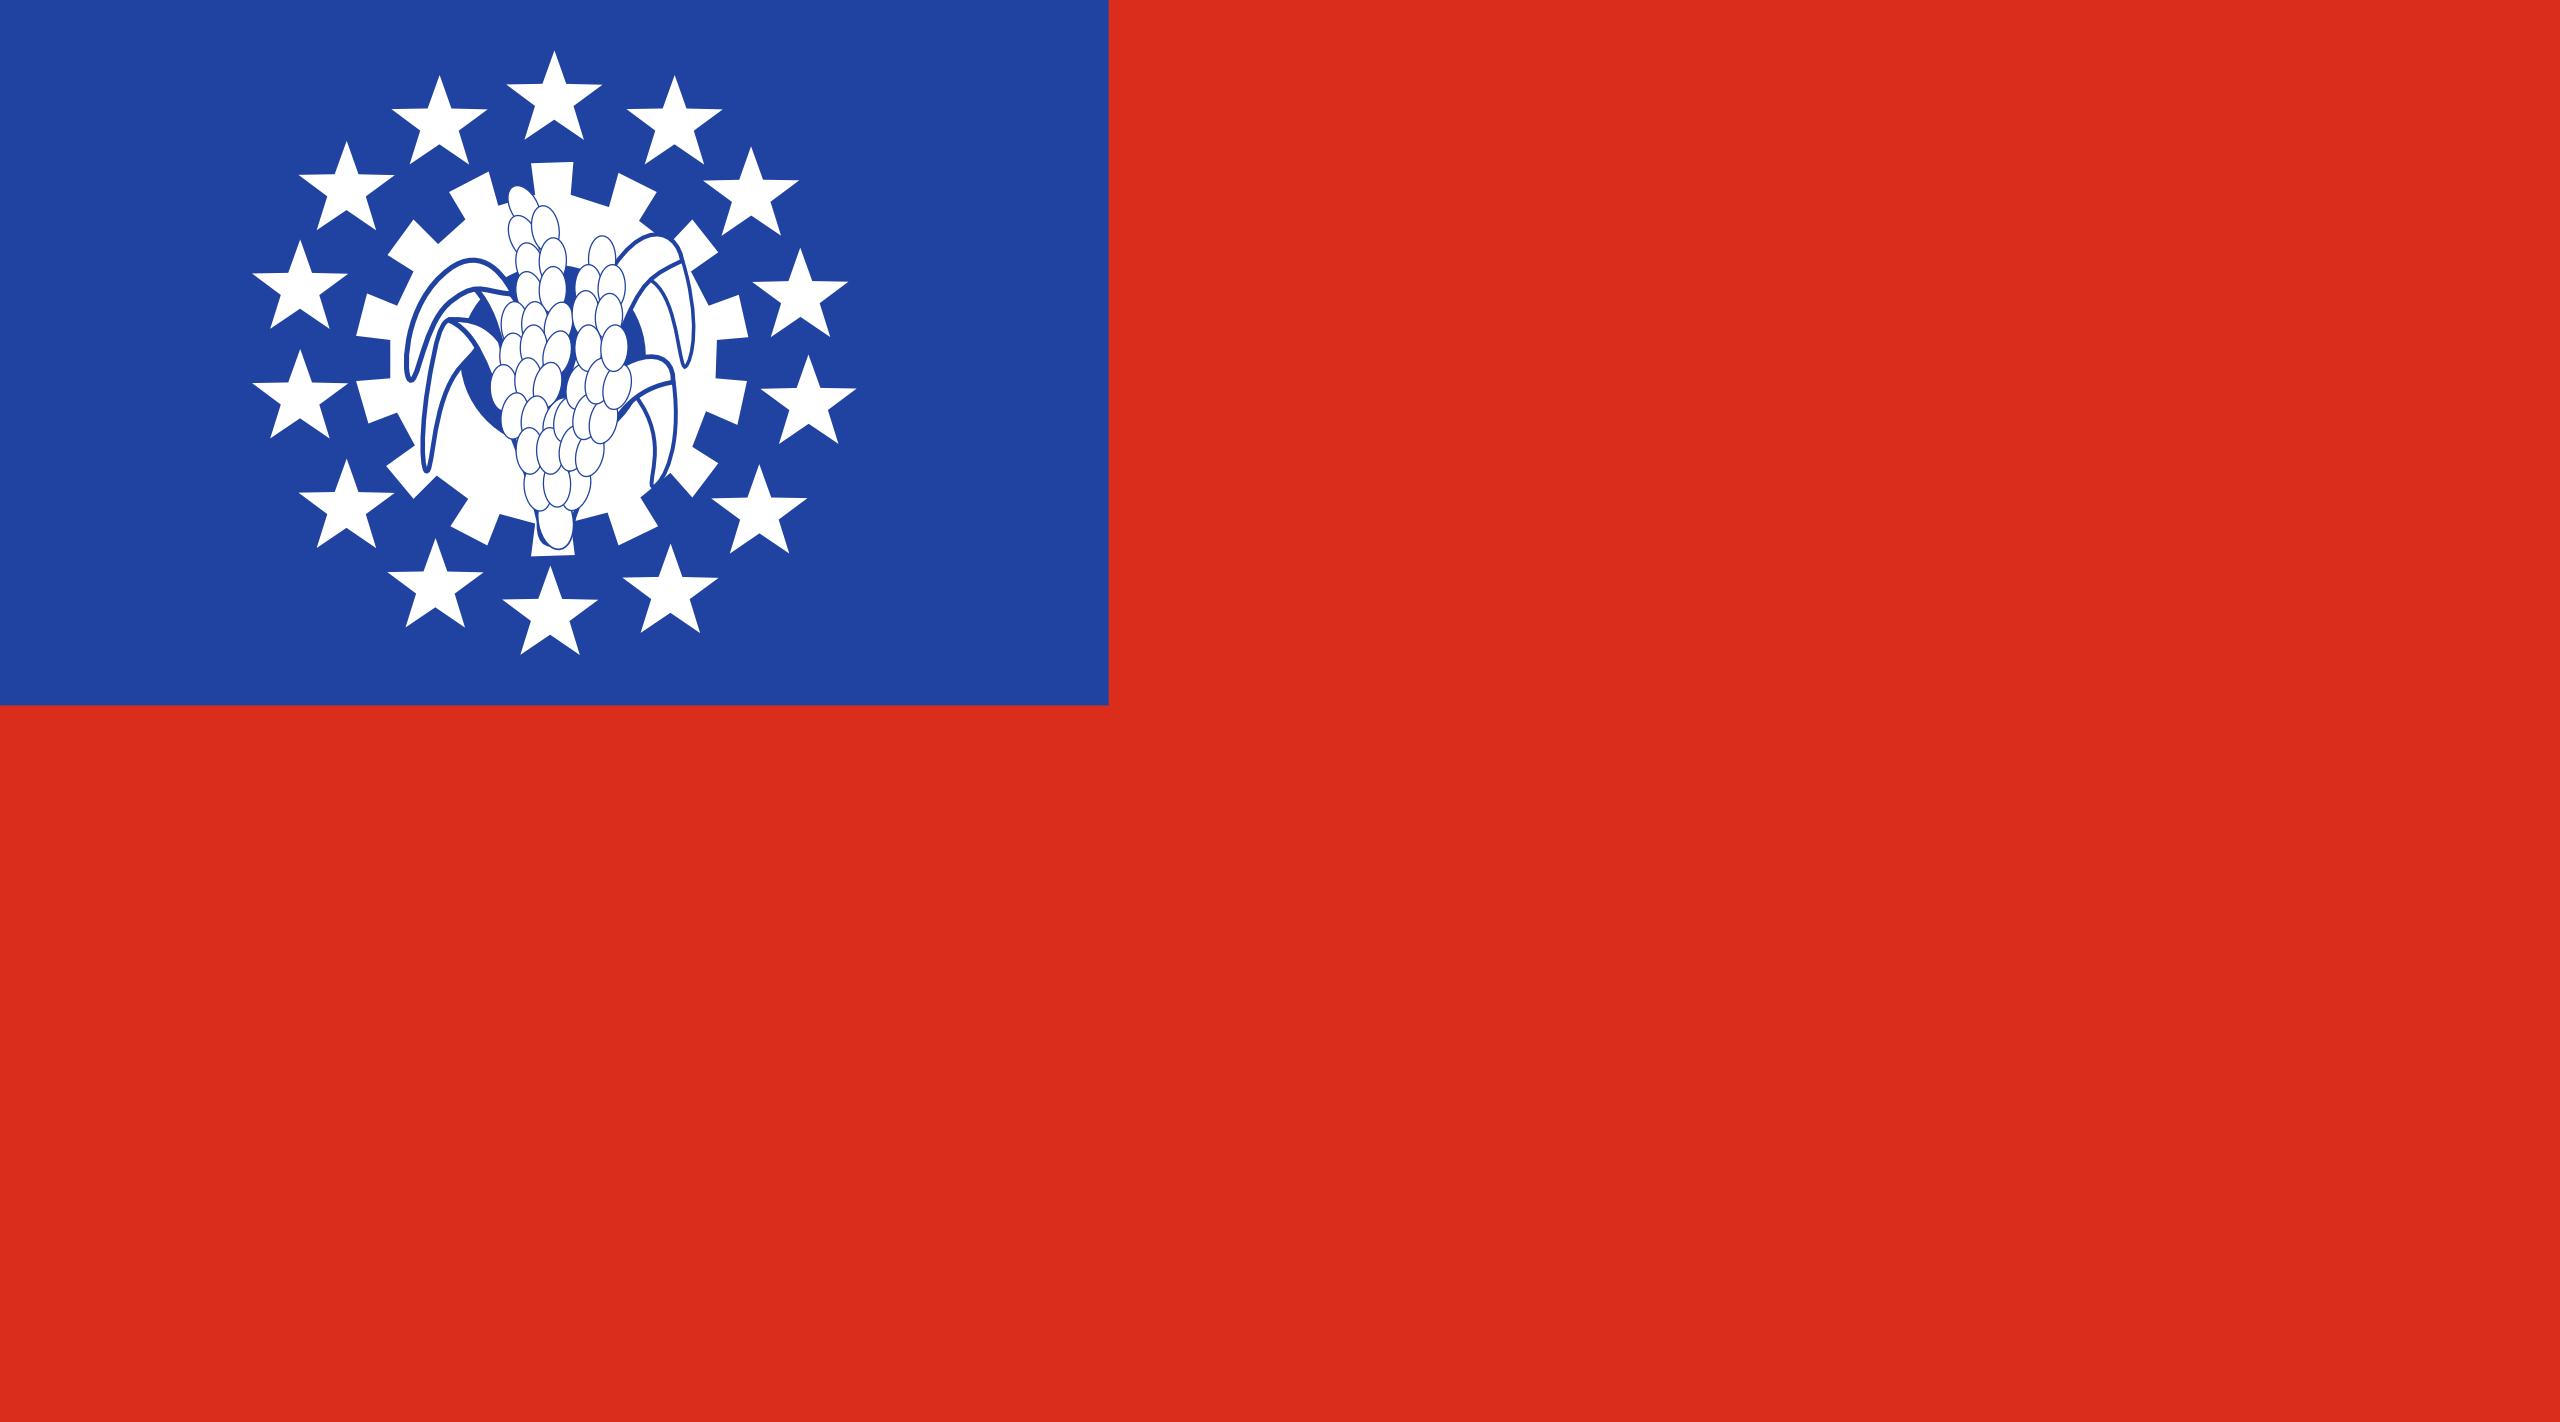 Birmanie, pays, emblème, logo, symbole - Fonds d'écran HD - Professor-falken.com